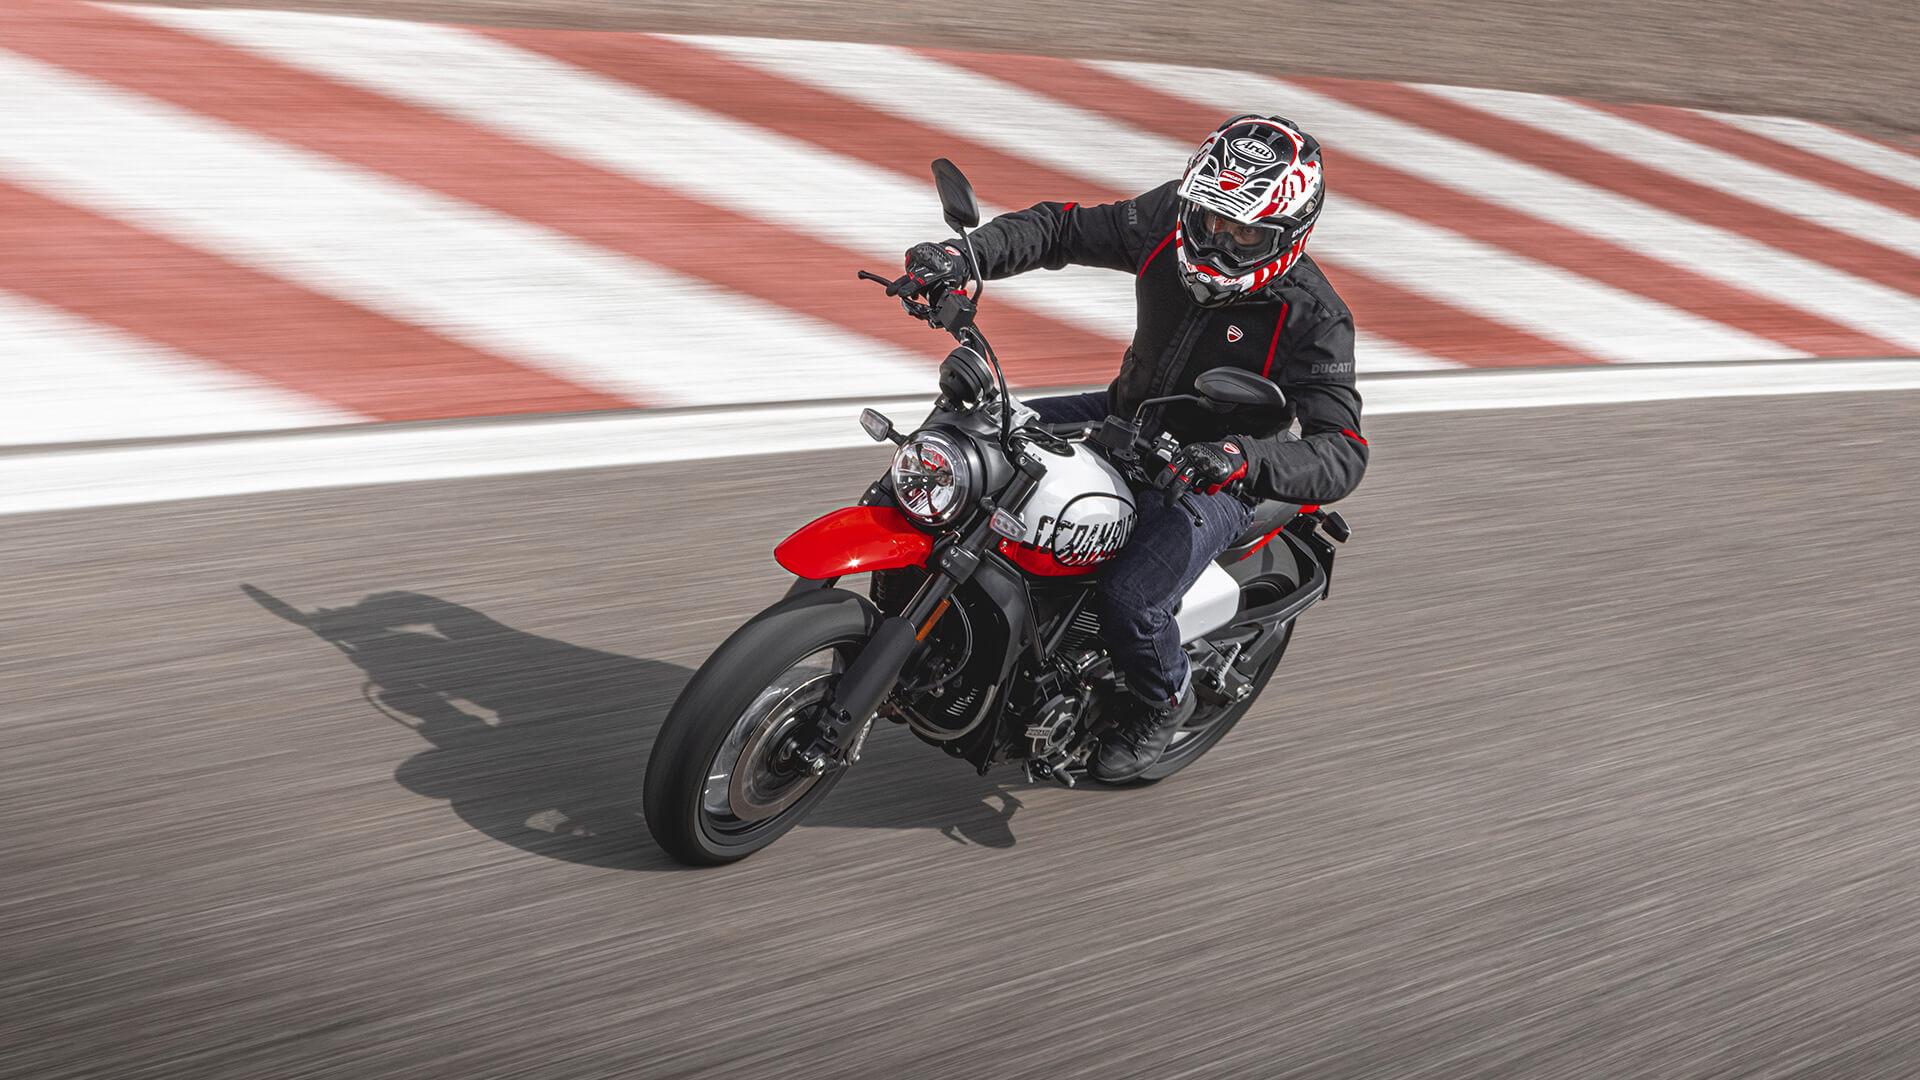 Ducati Scrambler amplia su gama: Tribute pro y Urban Motard 2022 (video) (image)